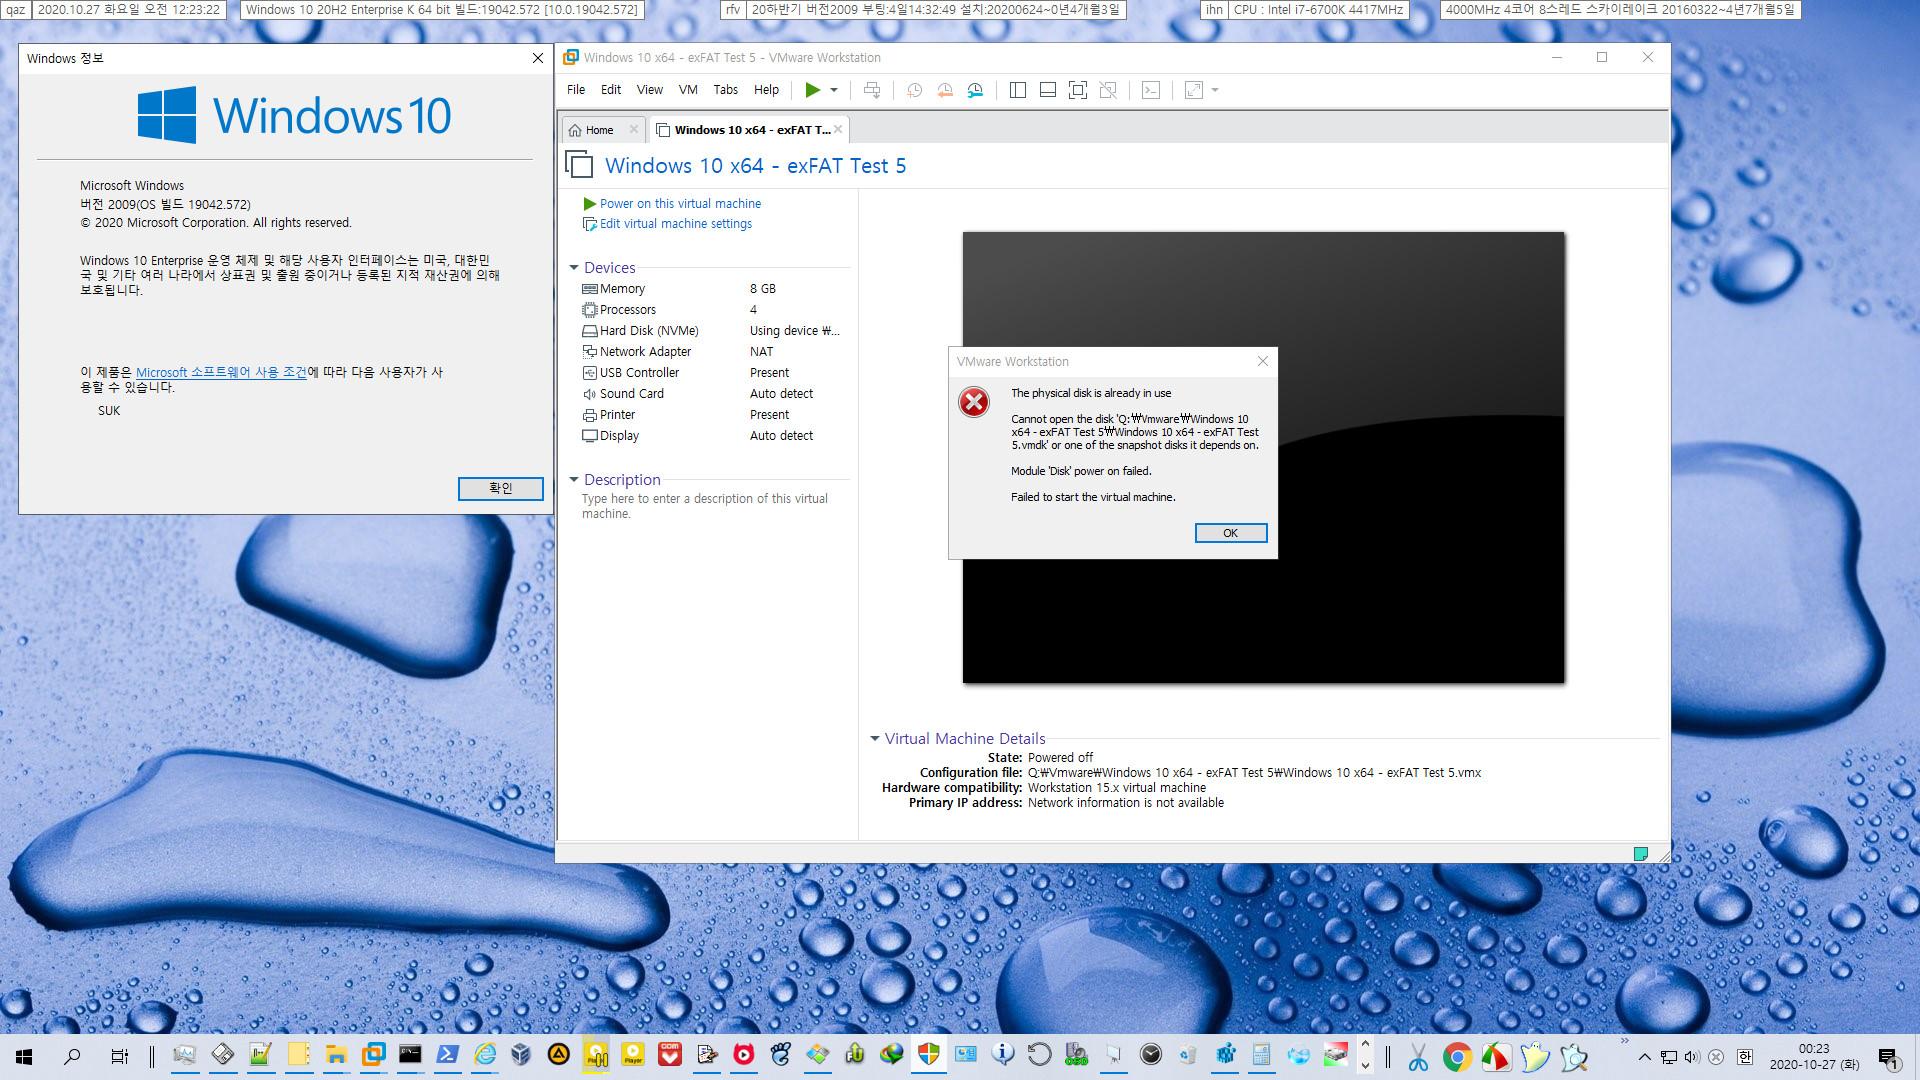 exFAT 포맷으로도 VHD 부팅이 Windows 10 버전 1903부터 된다고 하여 테스트 - 생고생만 하다가 컴퓨터 먹통 2번이나 되고 그만뒀습니다 2020-10-27_002322.jpg